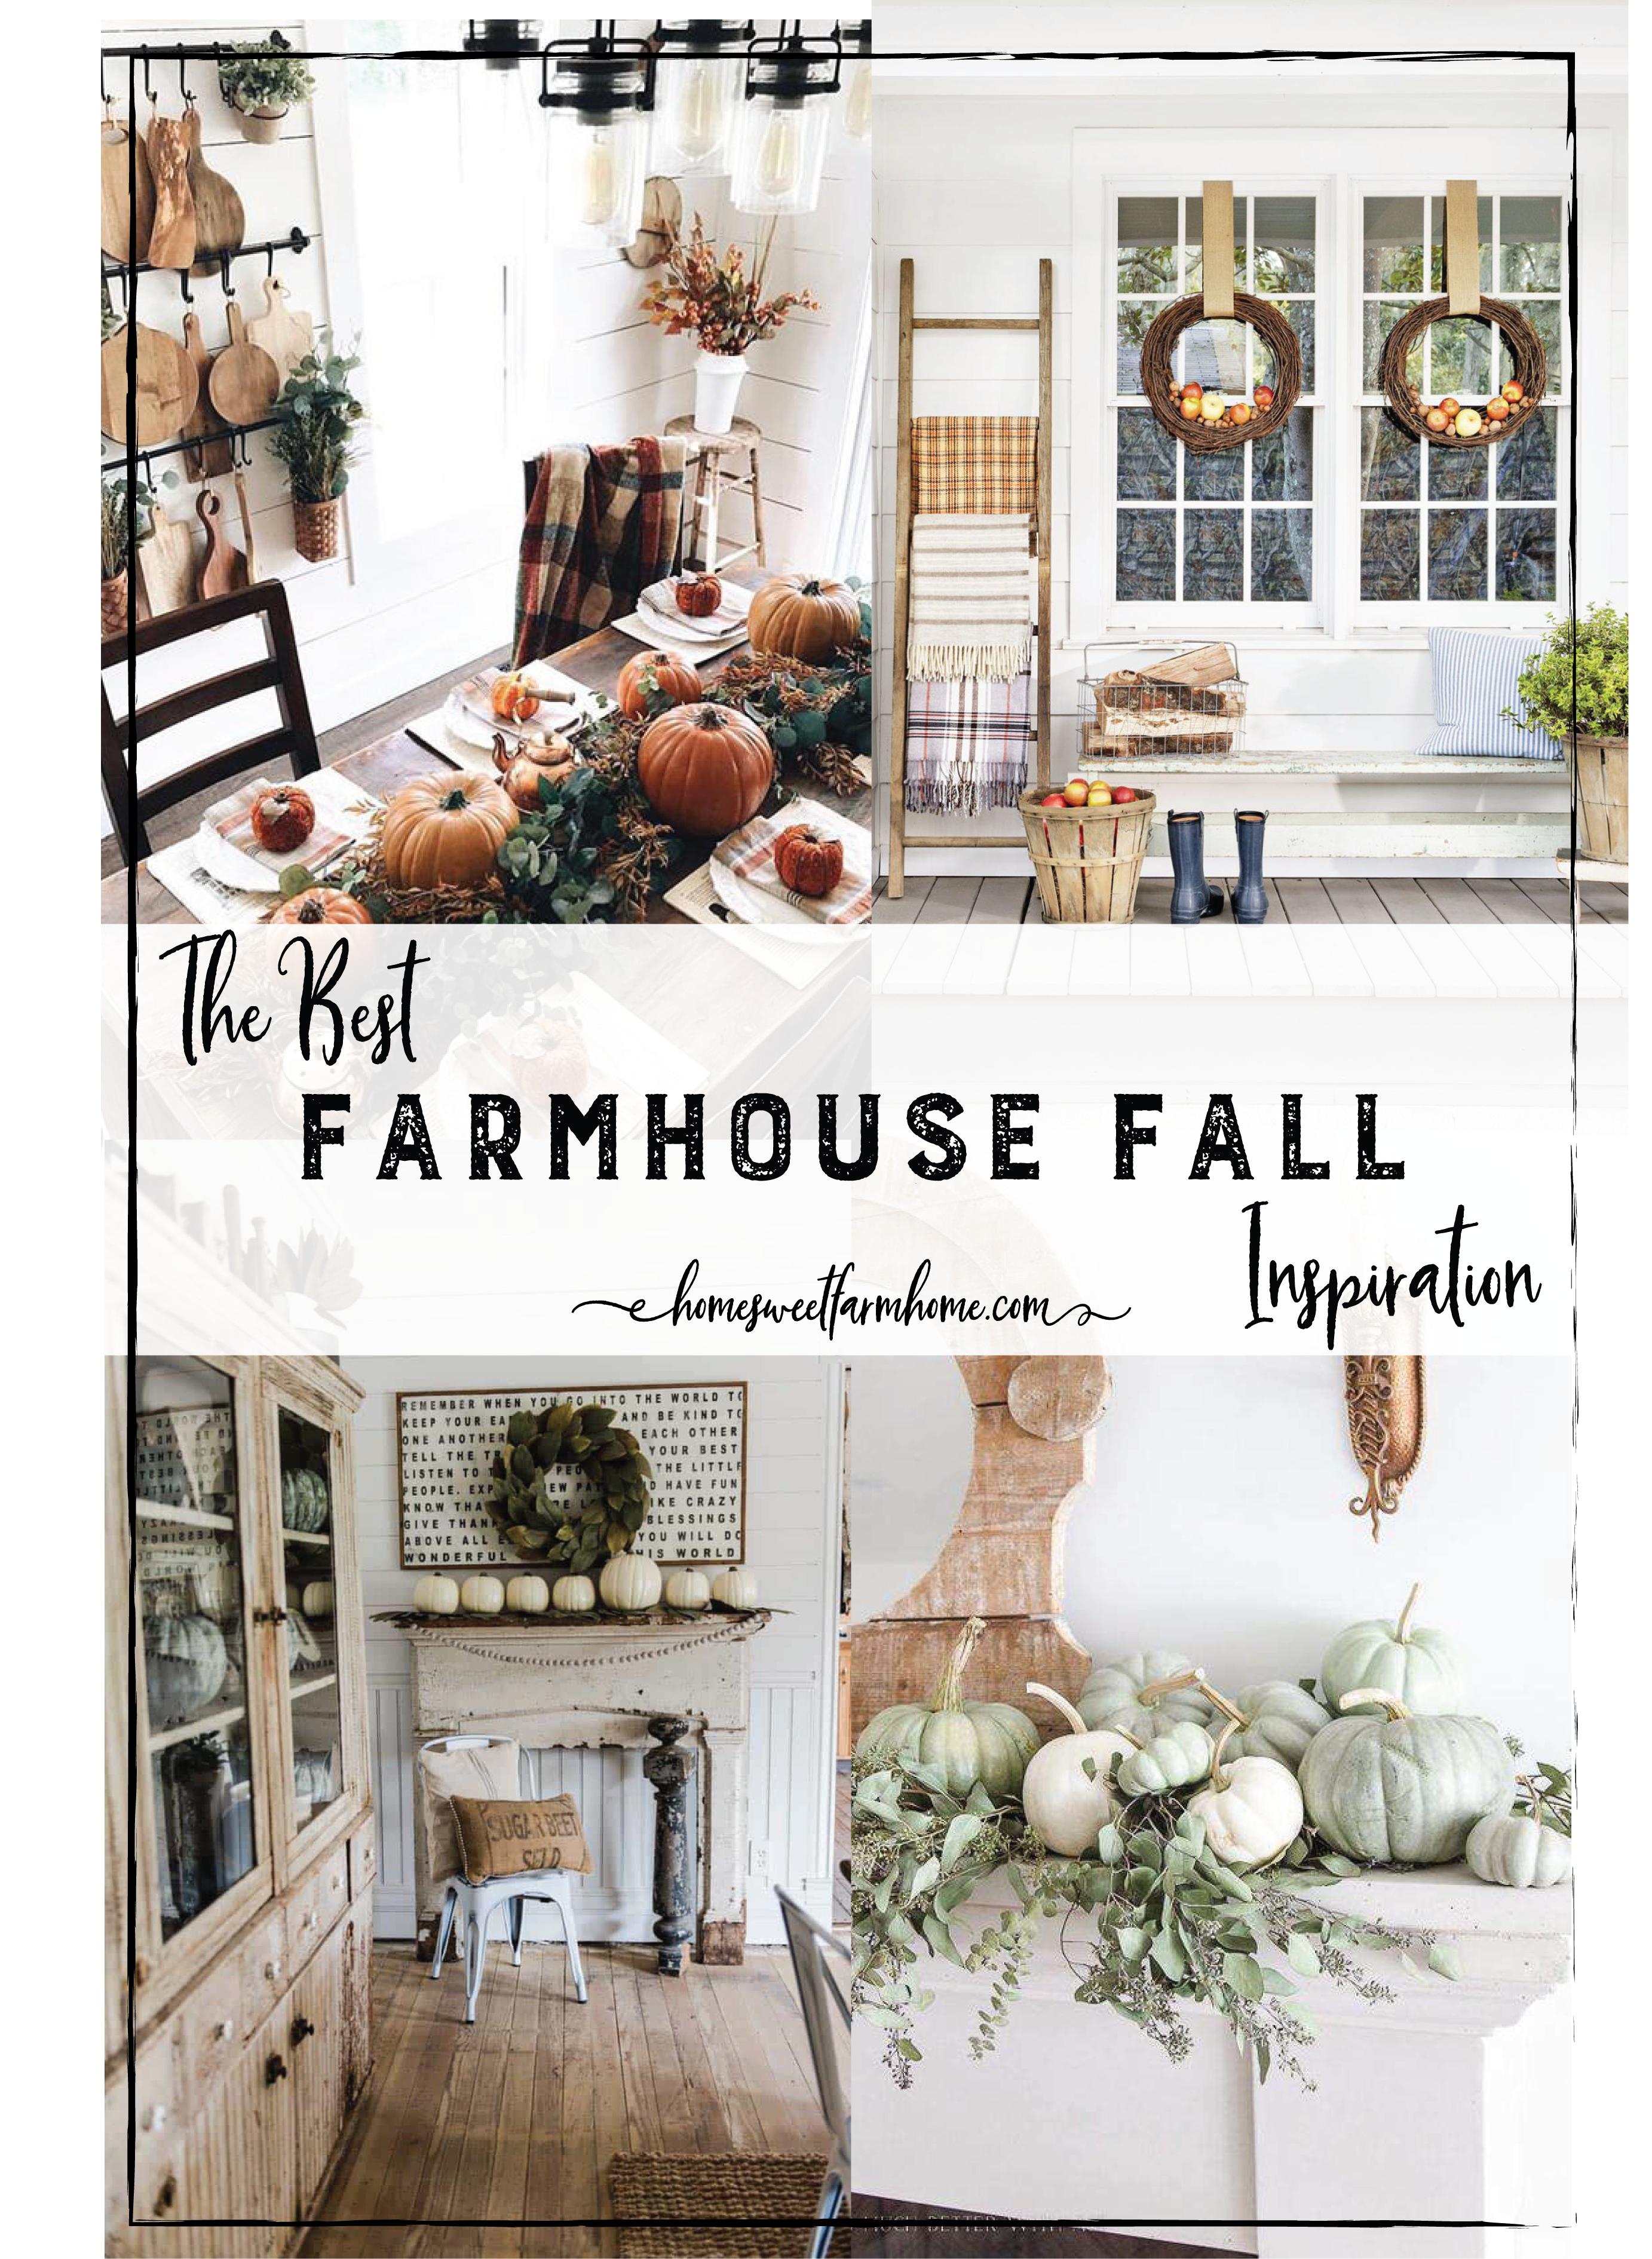 The Best Farmhouse Fall Decor Inspiration